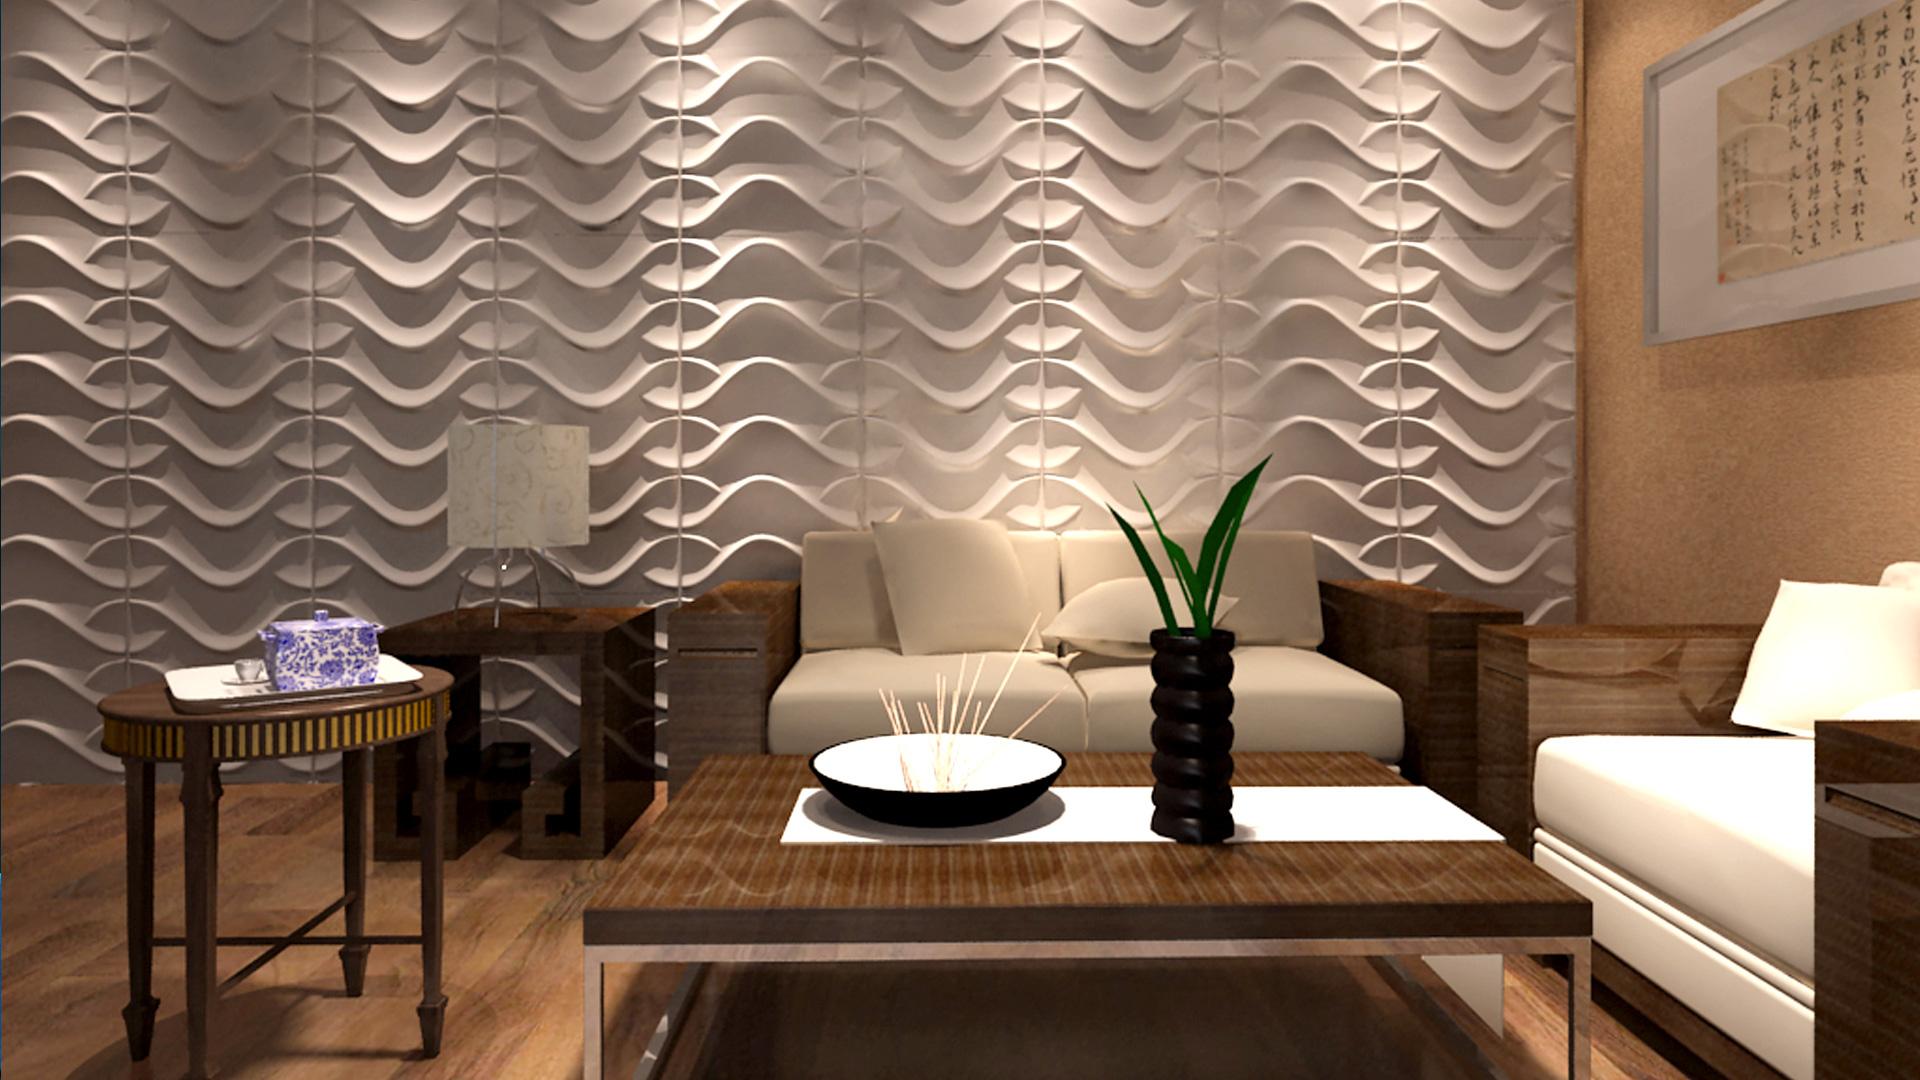 3D Wandpaneele   Produkte   Enric   Deckenpaneele   3D Tapeten    Wandverkleidung